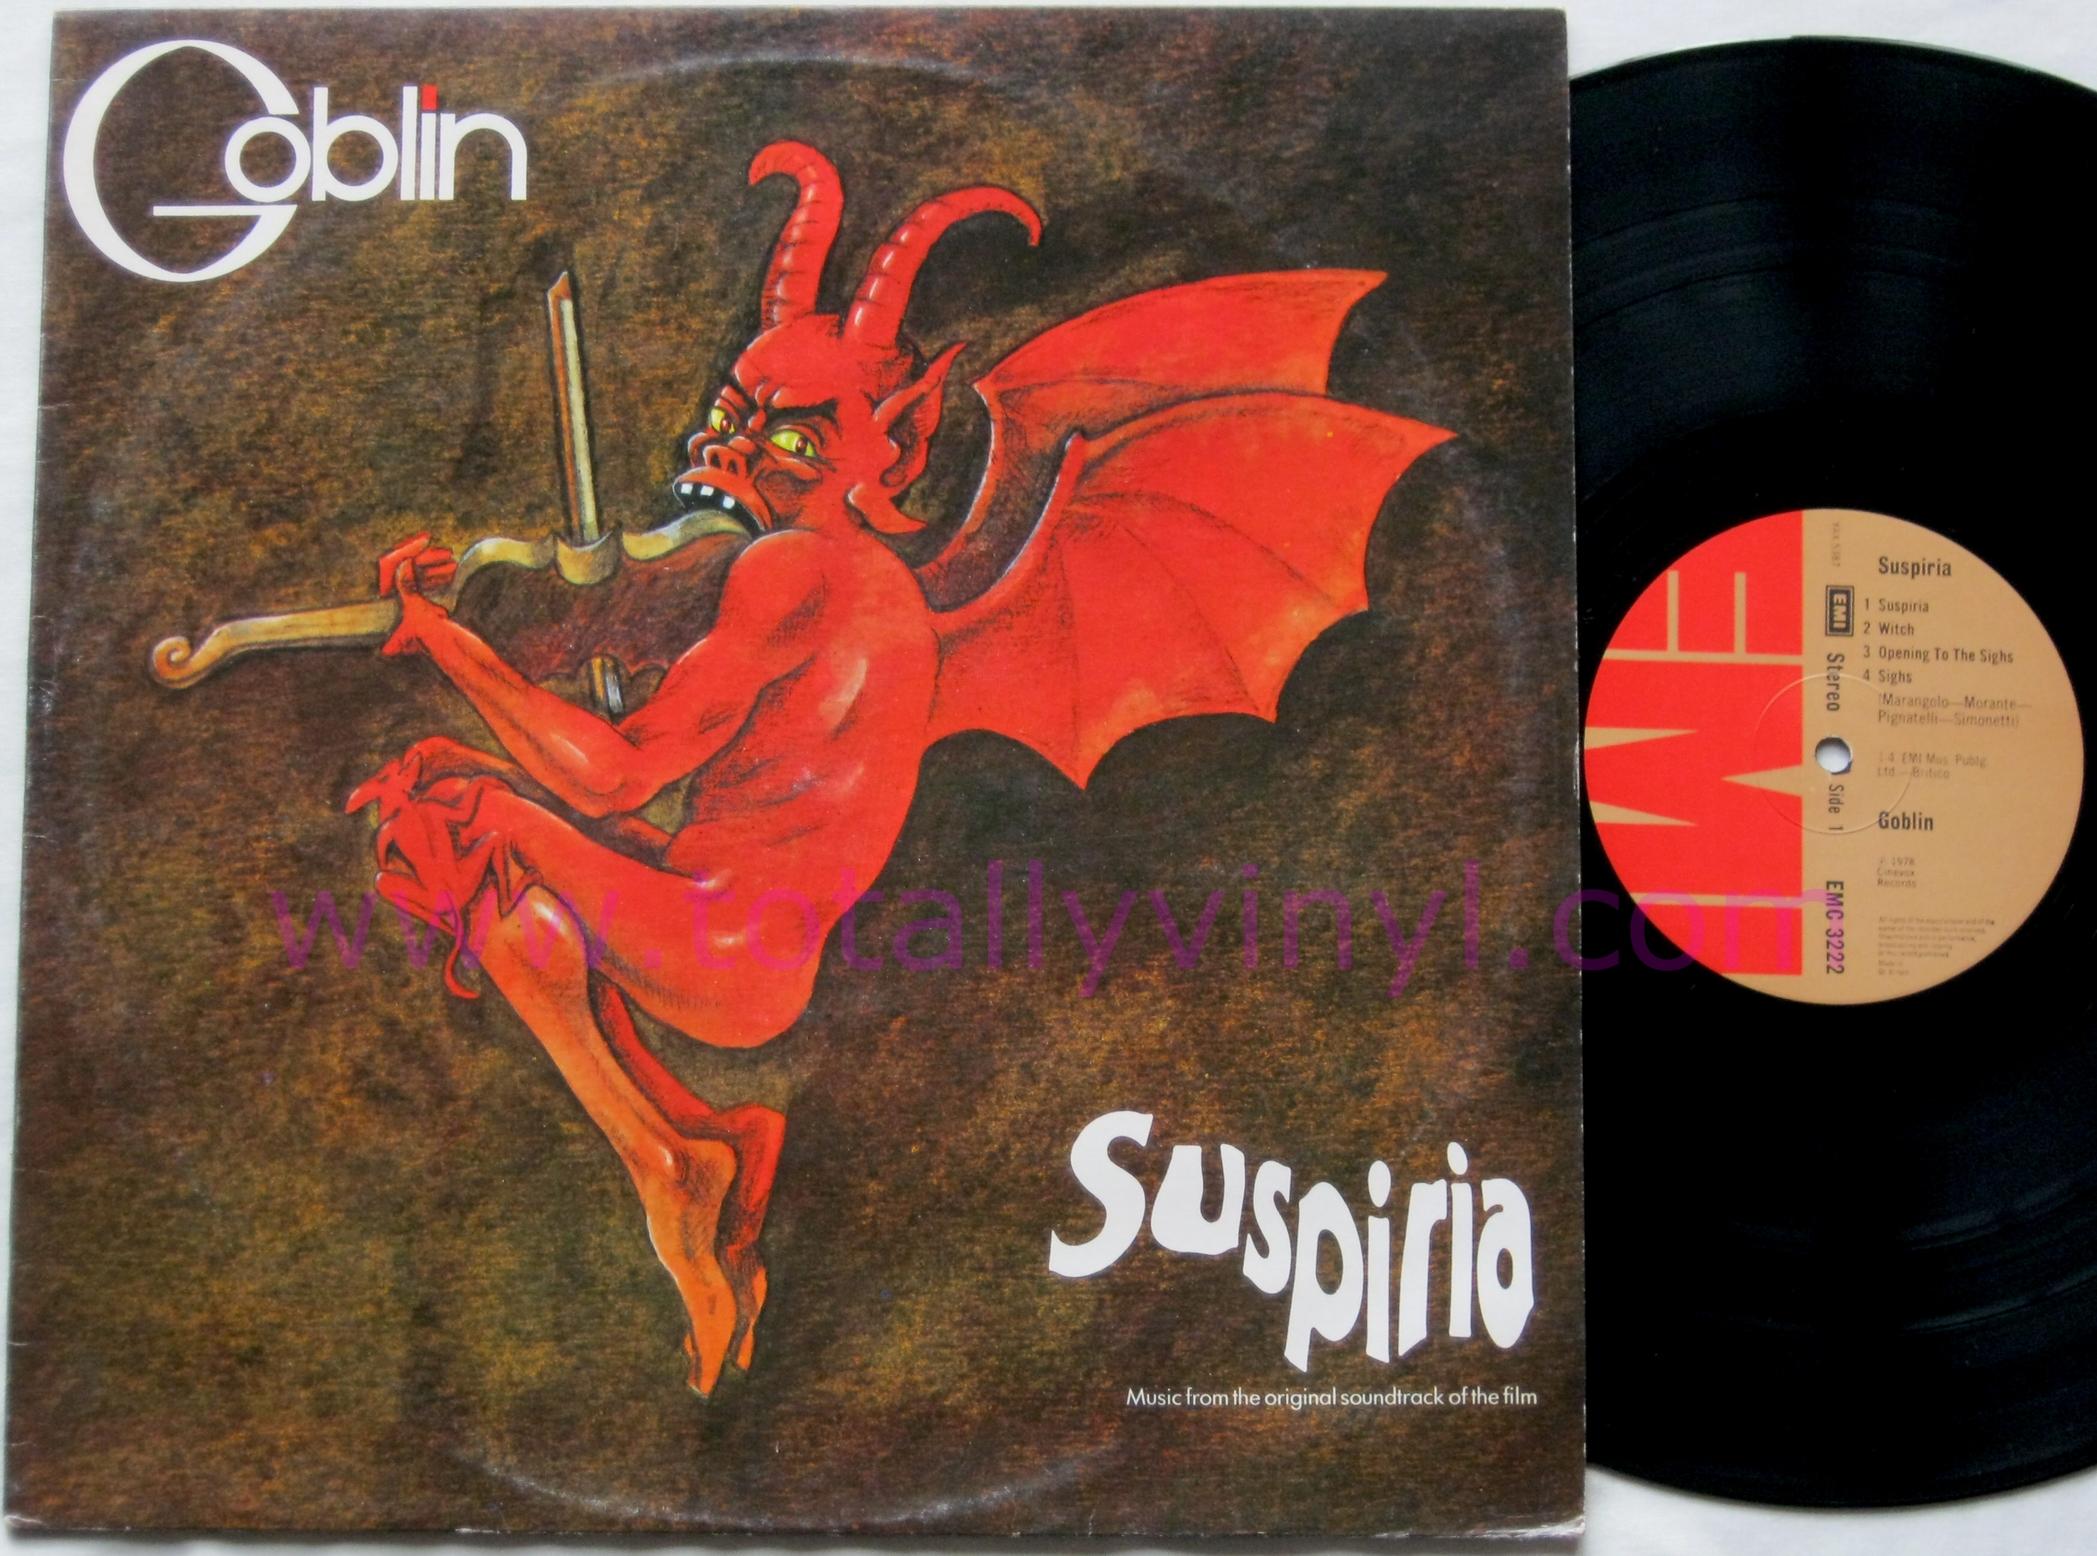 Totally Vinyl Records Goblin Suspiria Soundtrack Lp Vinyl